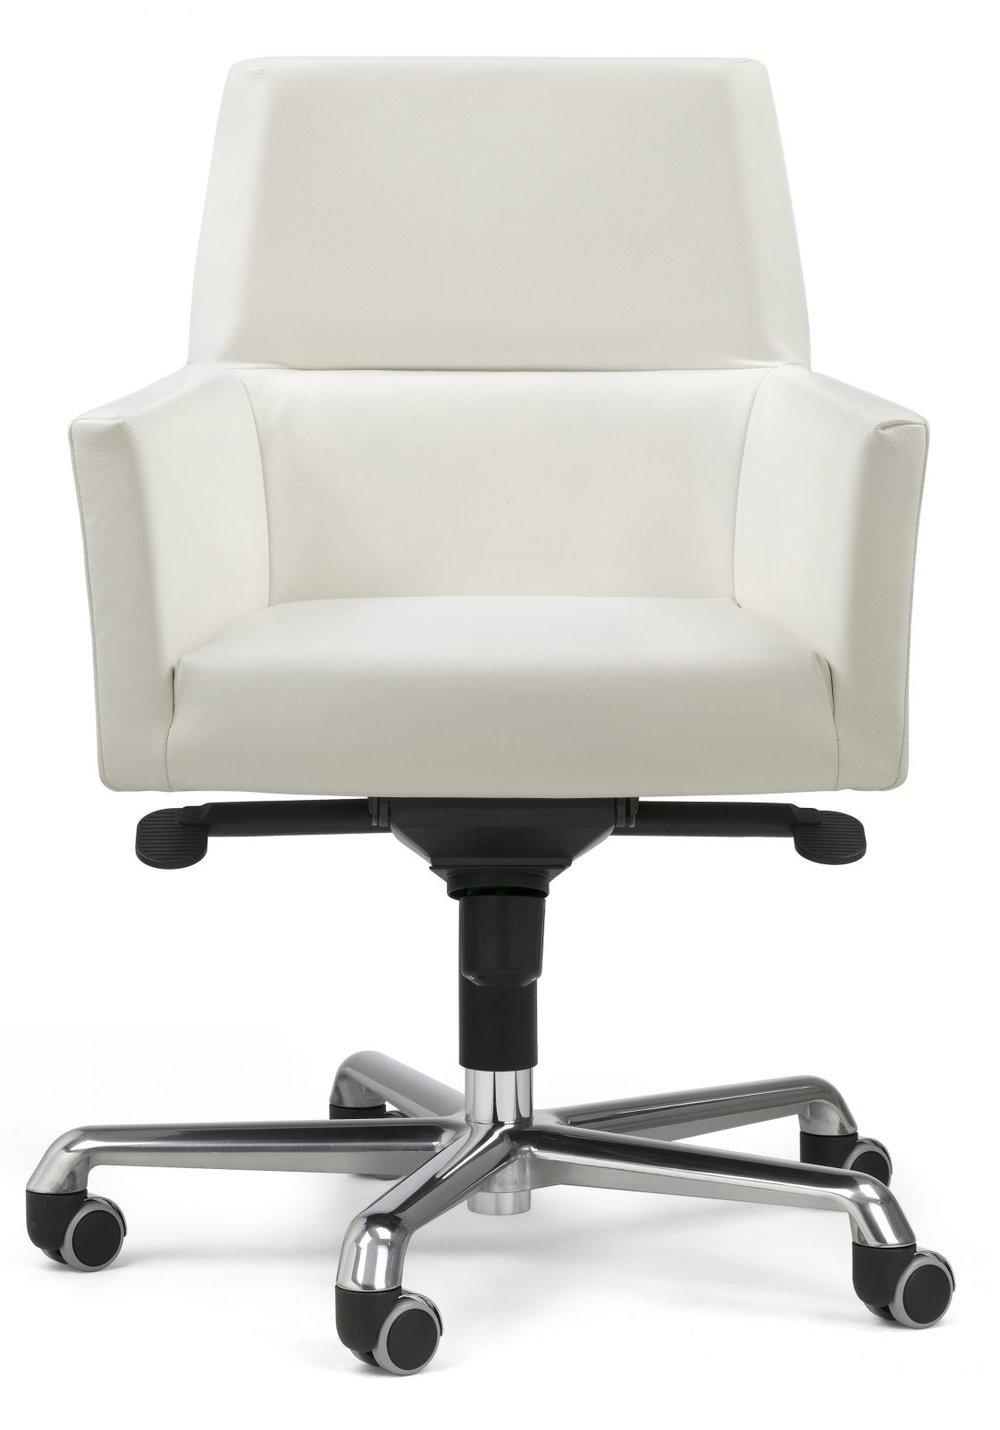 modern-office-chairs-Italian-furniture-designer-chairs (17).jpg